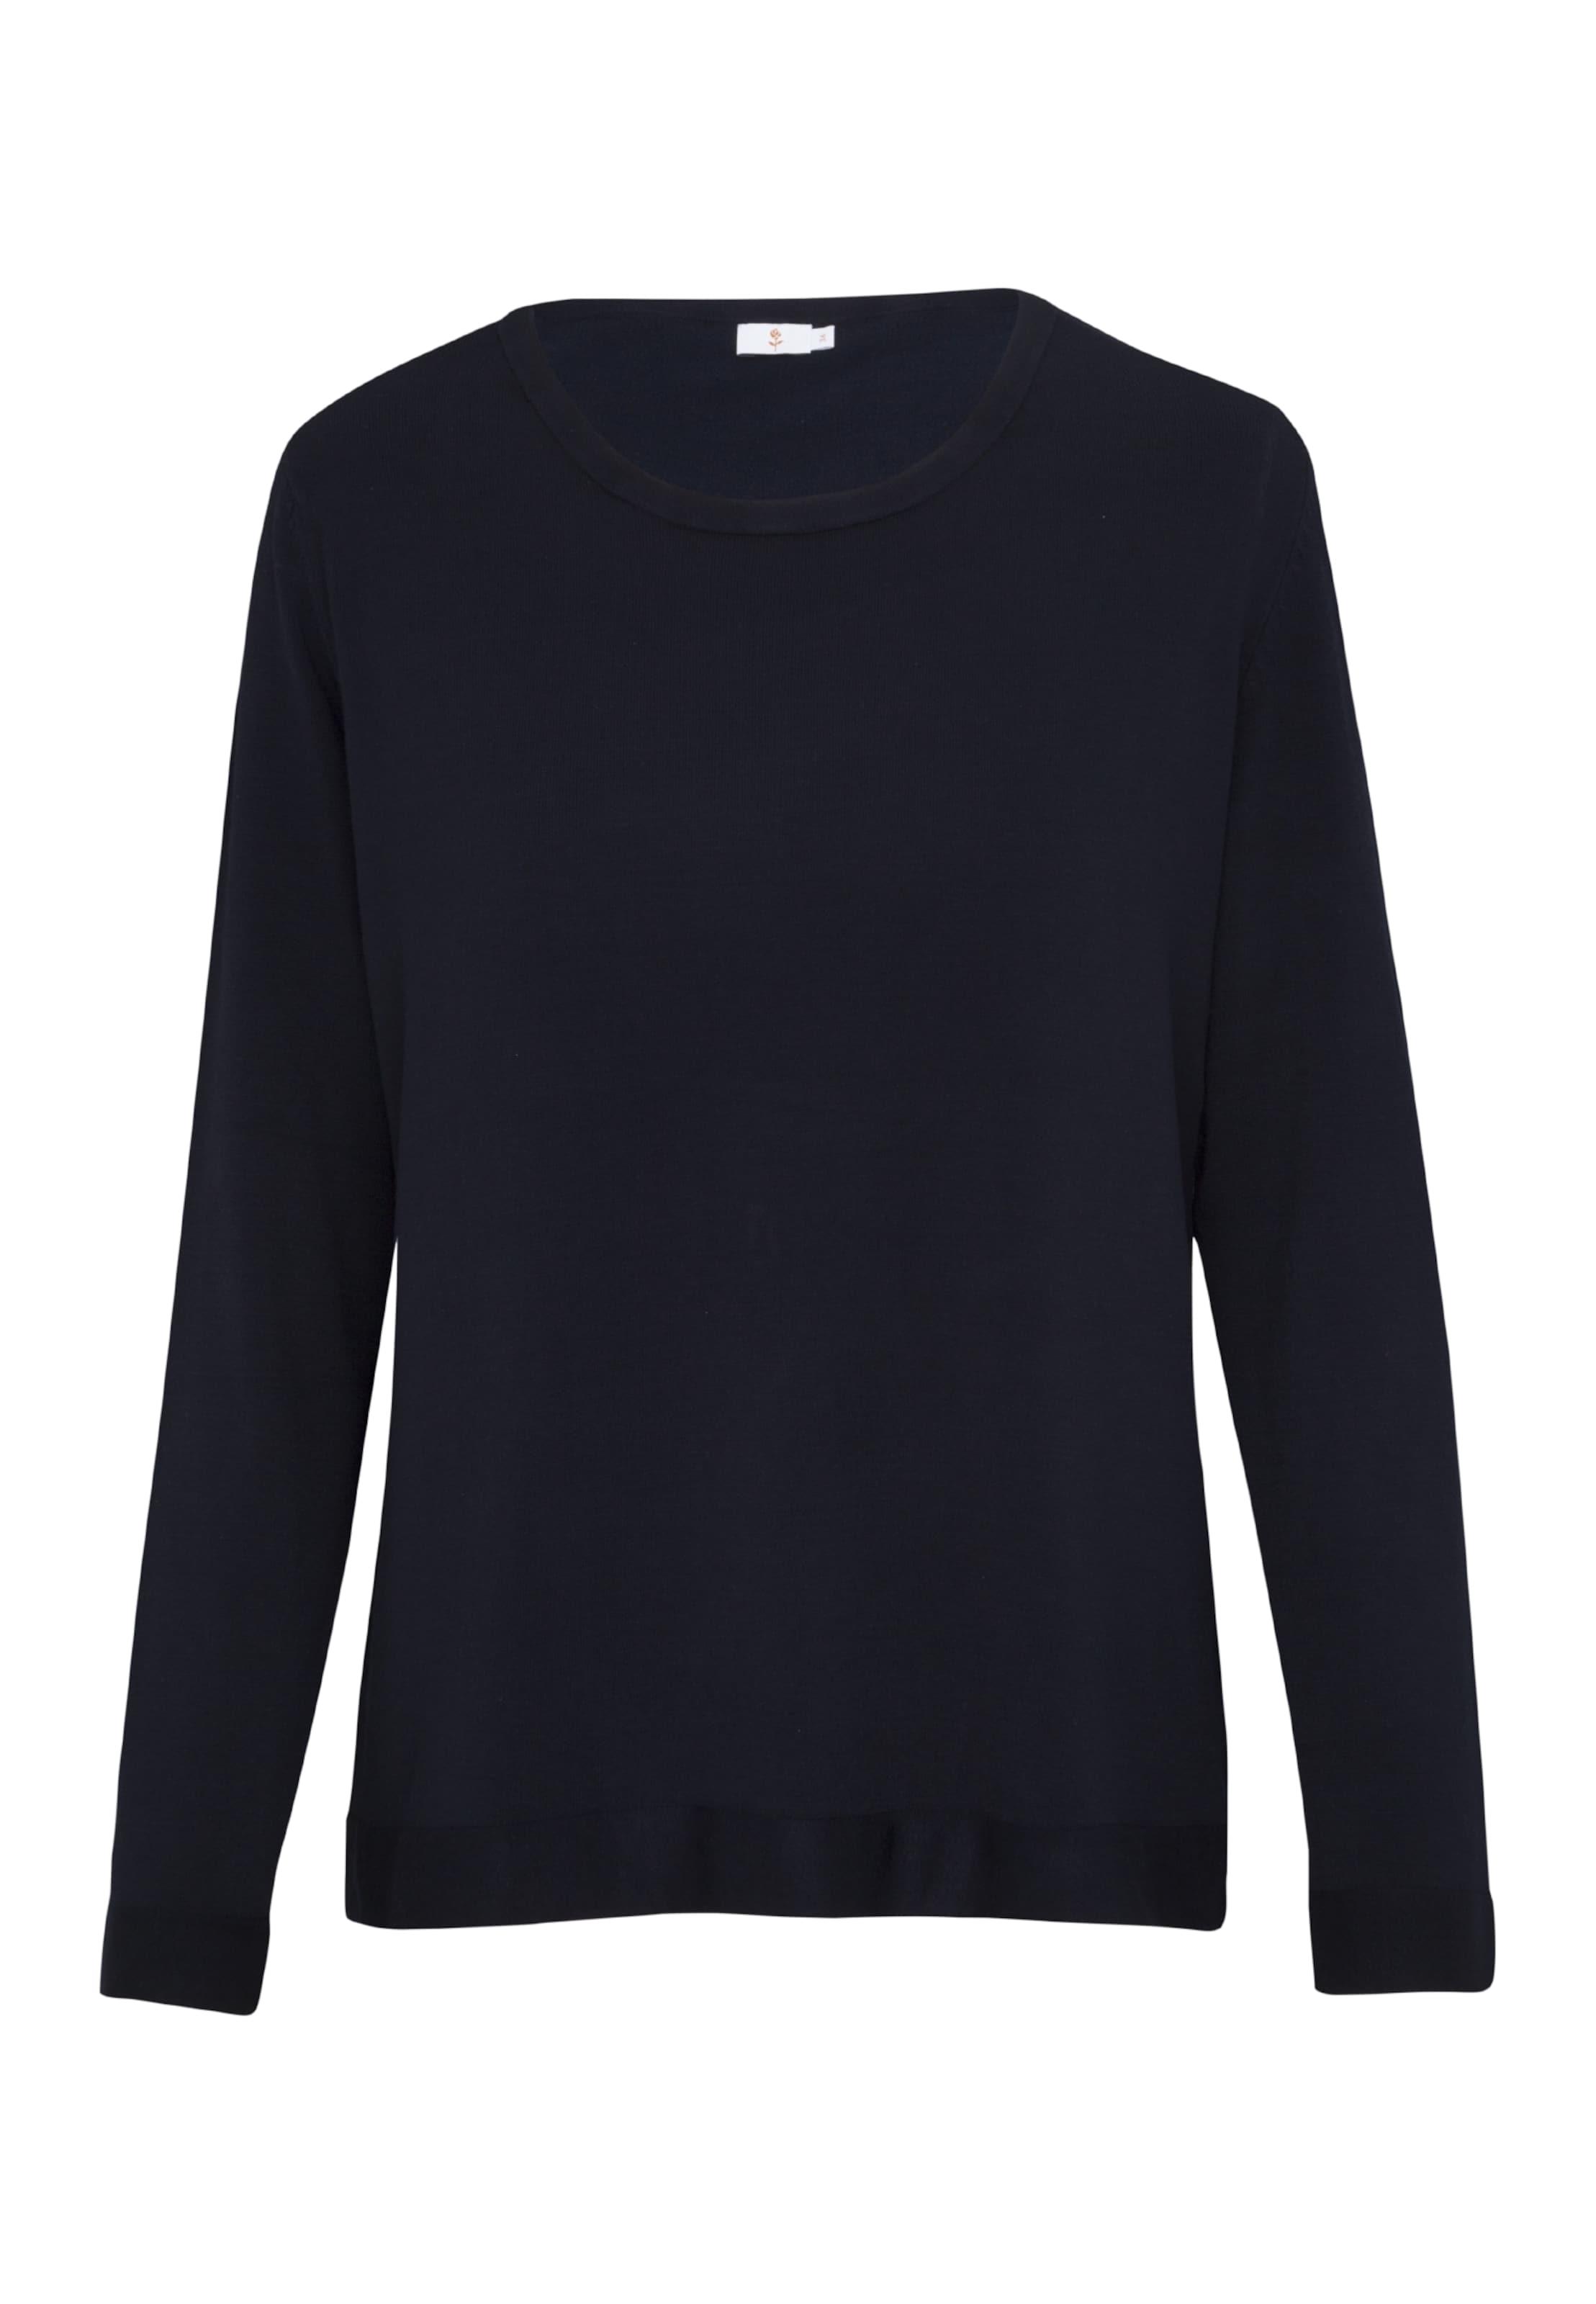 schwarze In Seidensticker Schwarz Pullover Rose' 3jLqRAc54